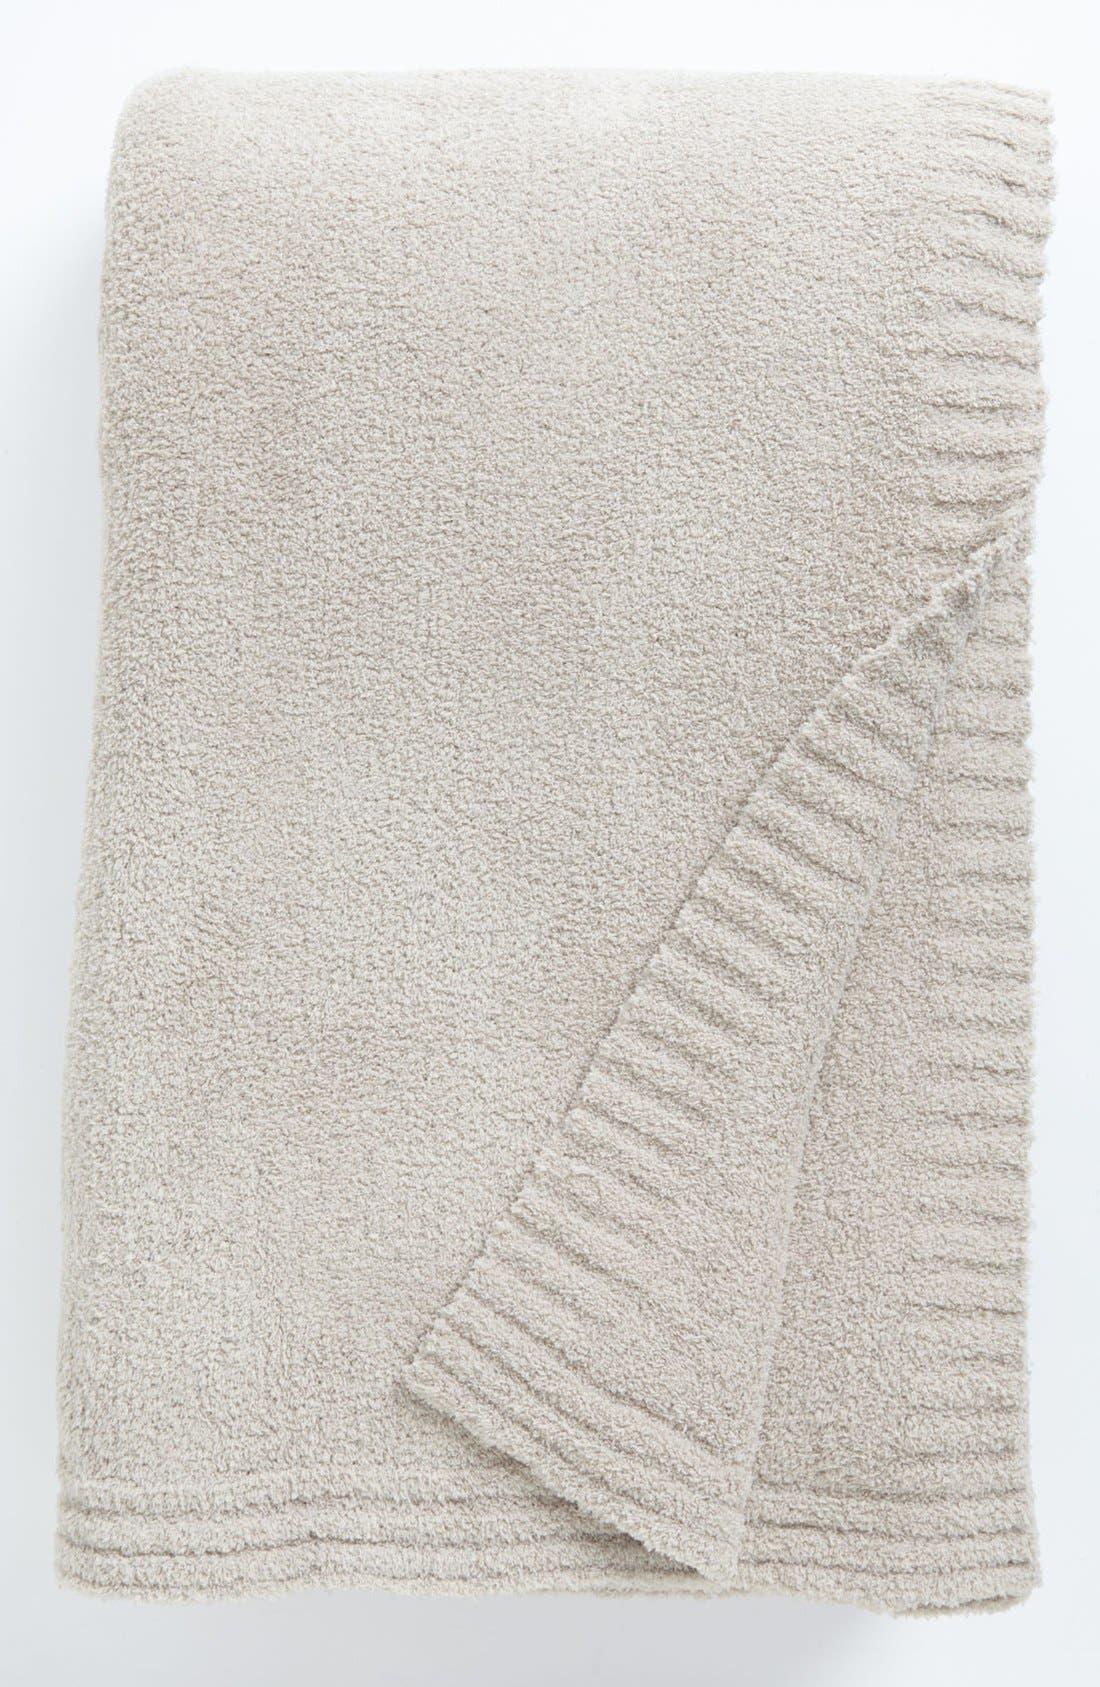 'Butter' Knit Blanket, Main, color, 280